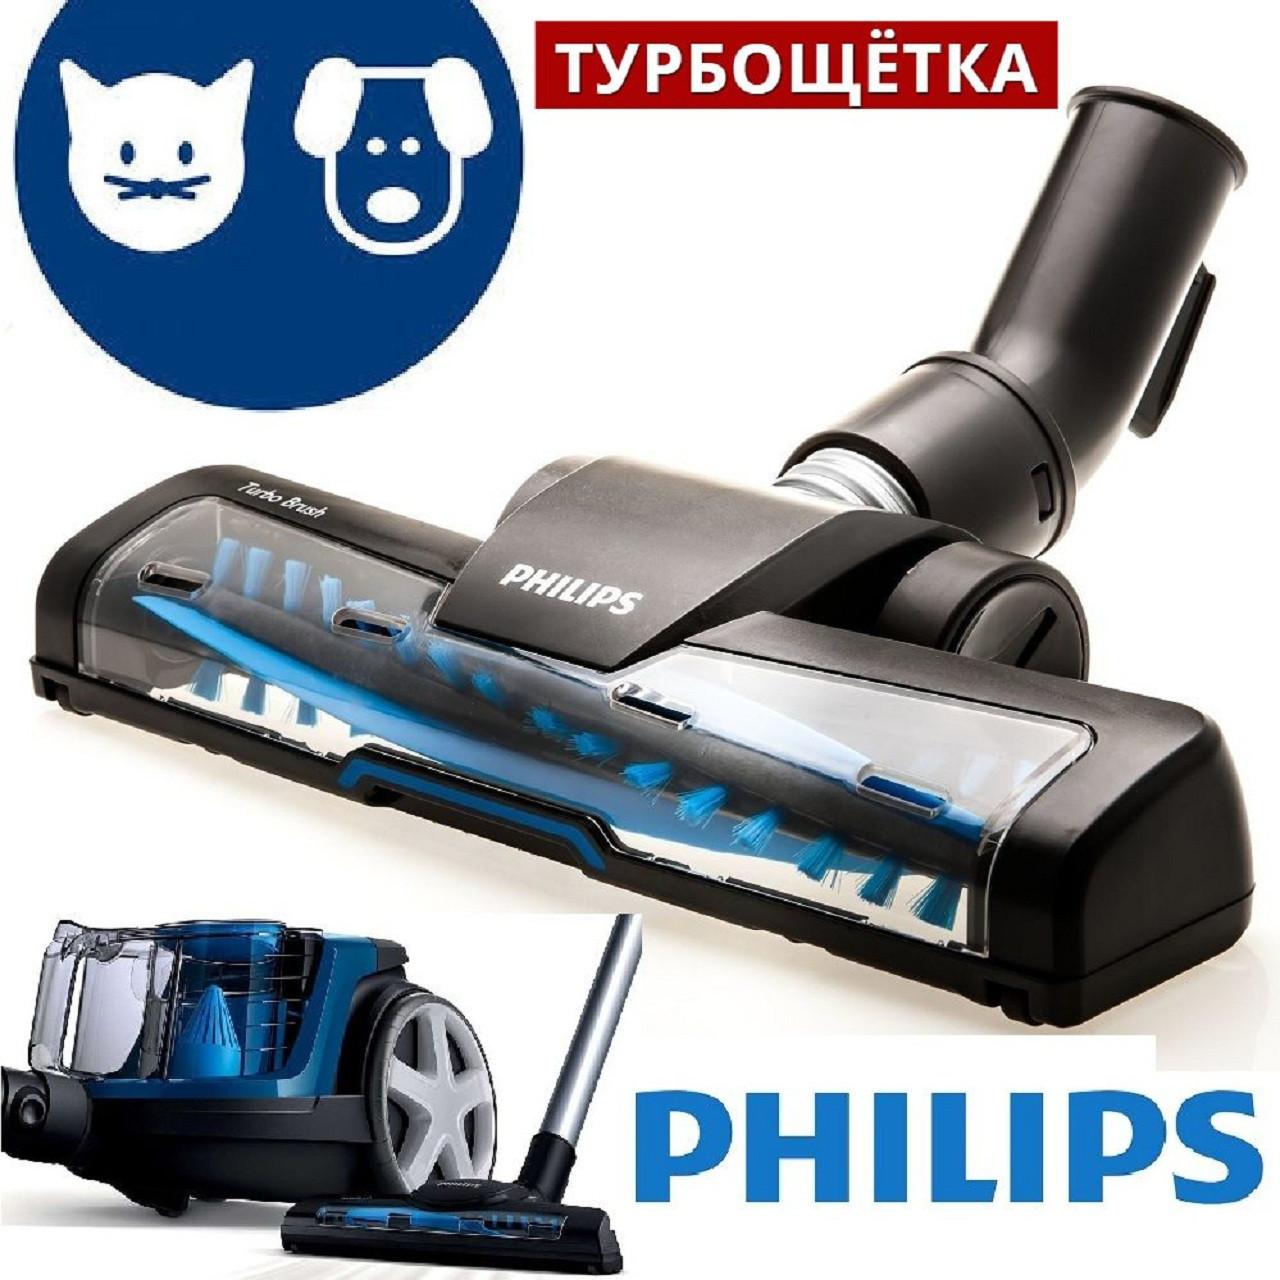 Турбощетка Philips для пылесоса fc 9170, fc 9174, fc 9176, fc8295, fc8767, fc8761, fc8661, fc8474, fc8471